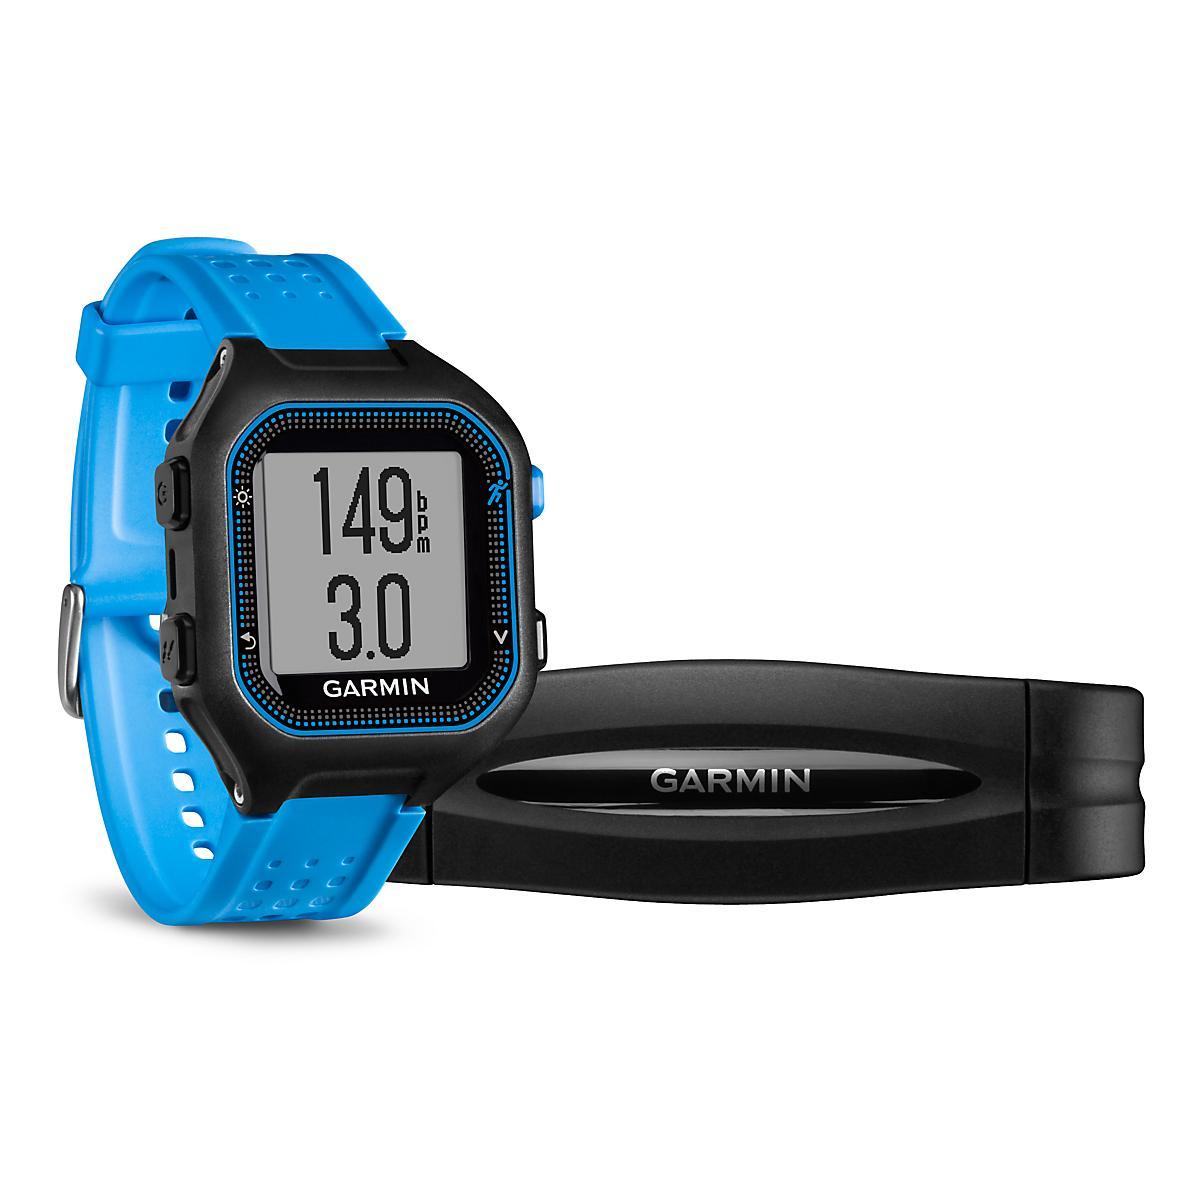 Garmin�Forerunner 25 GPS with HRM